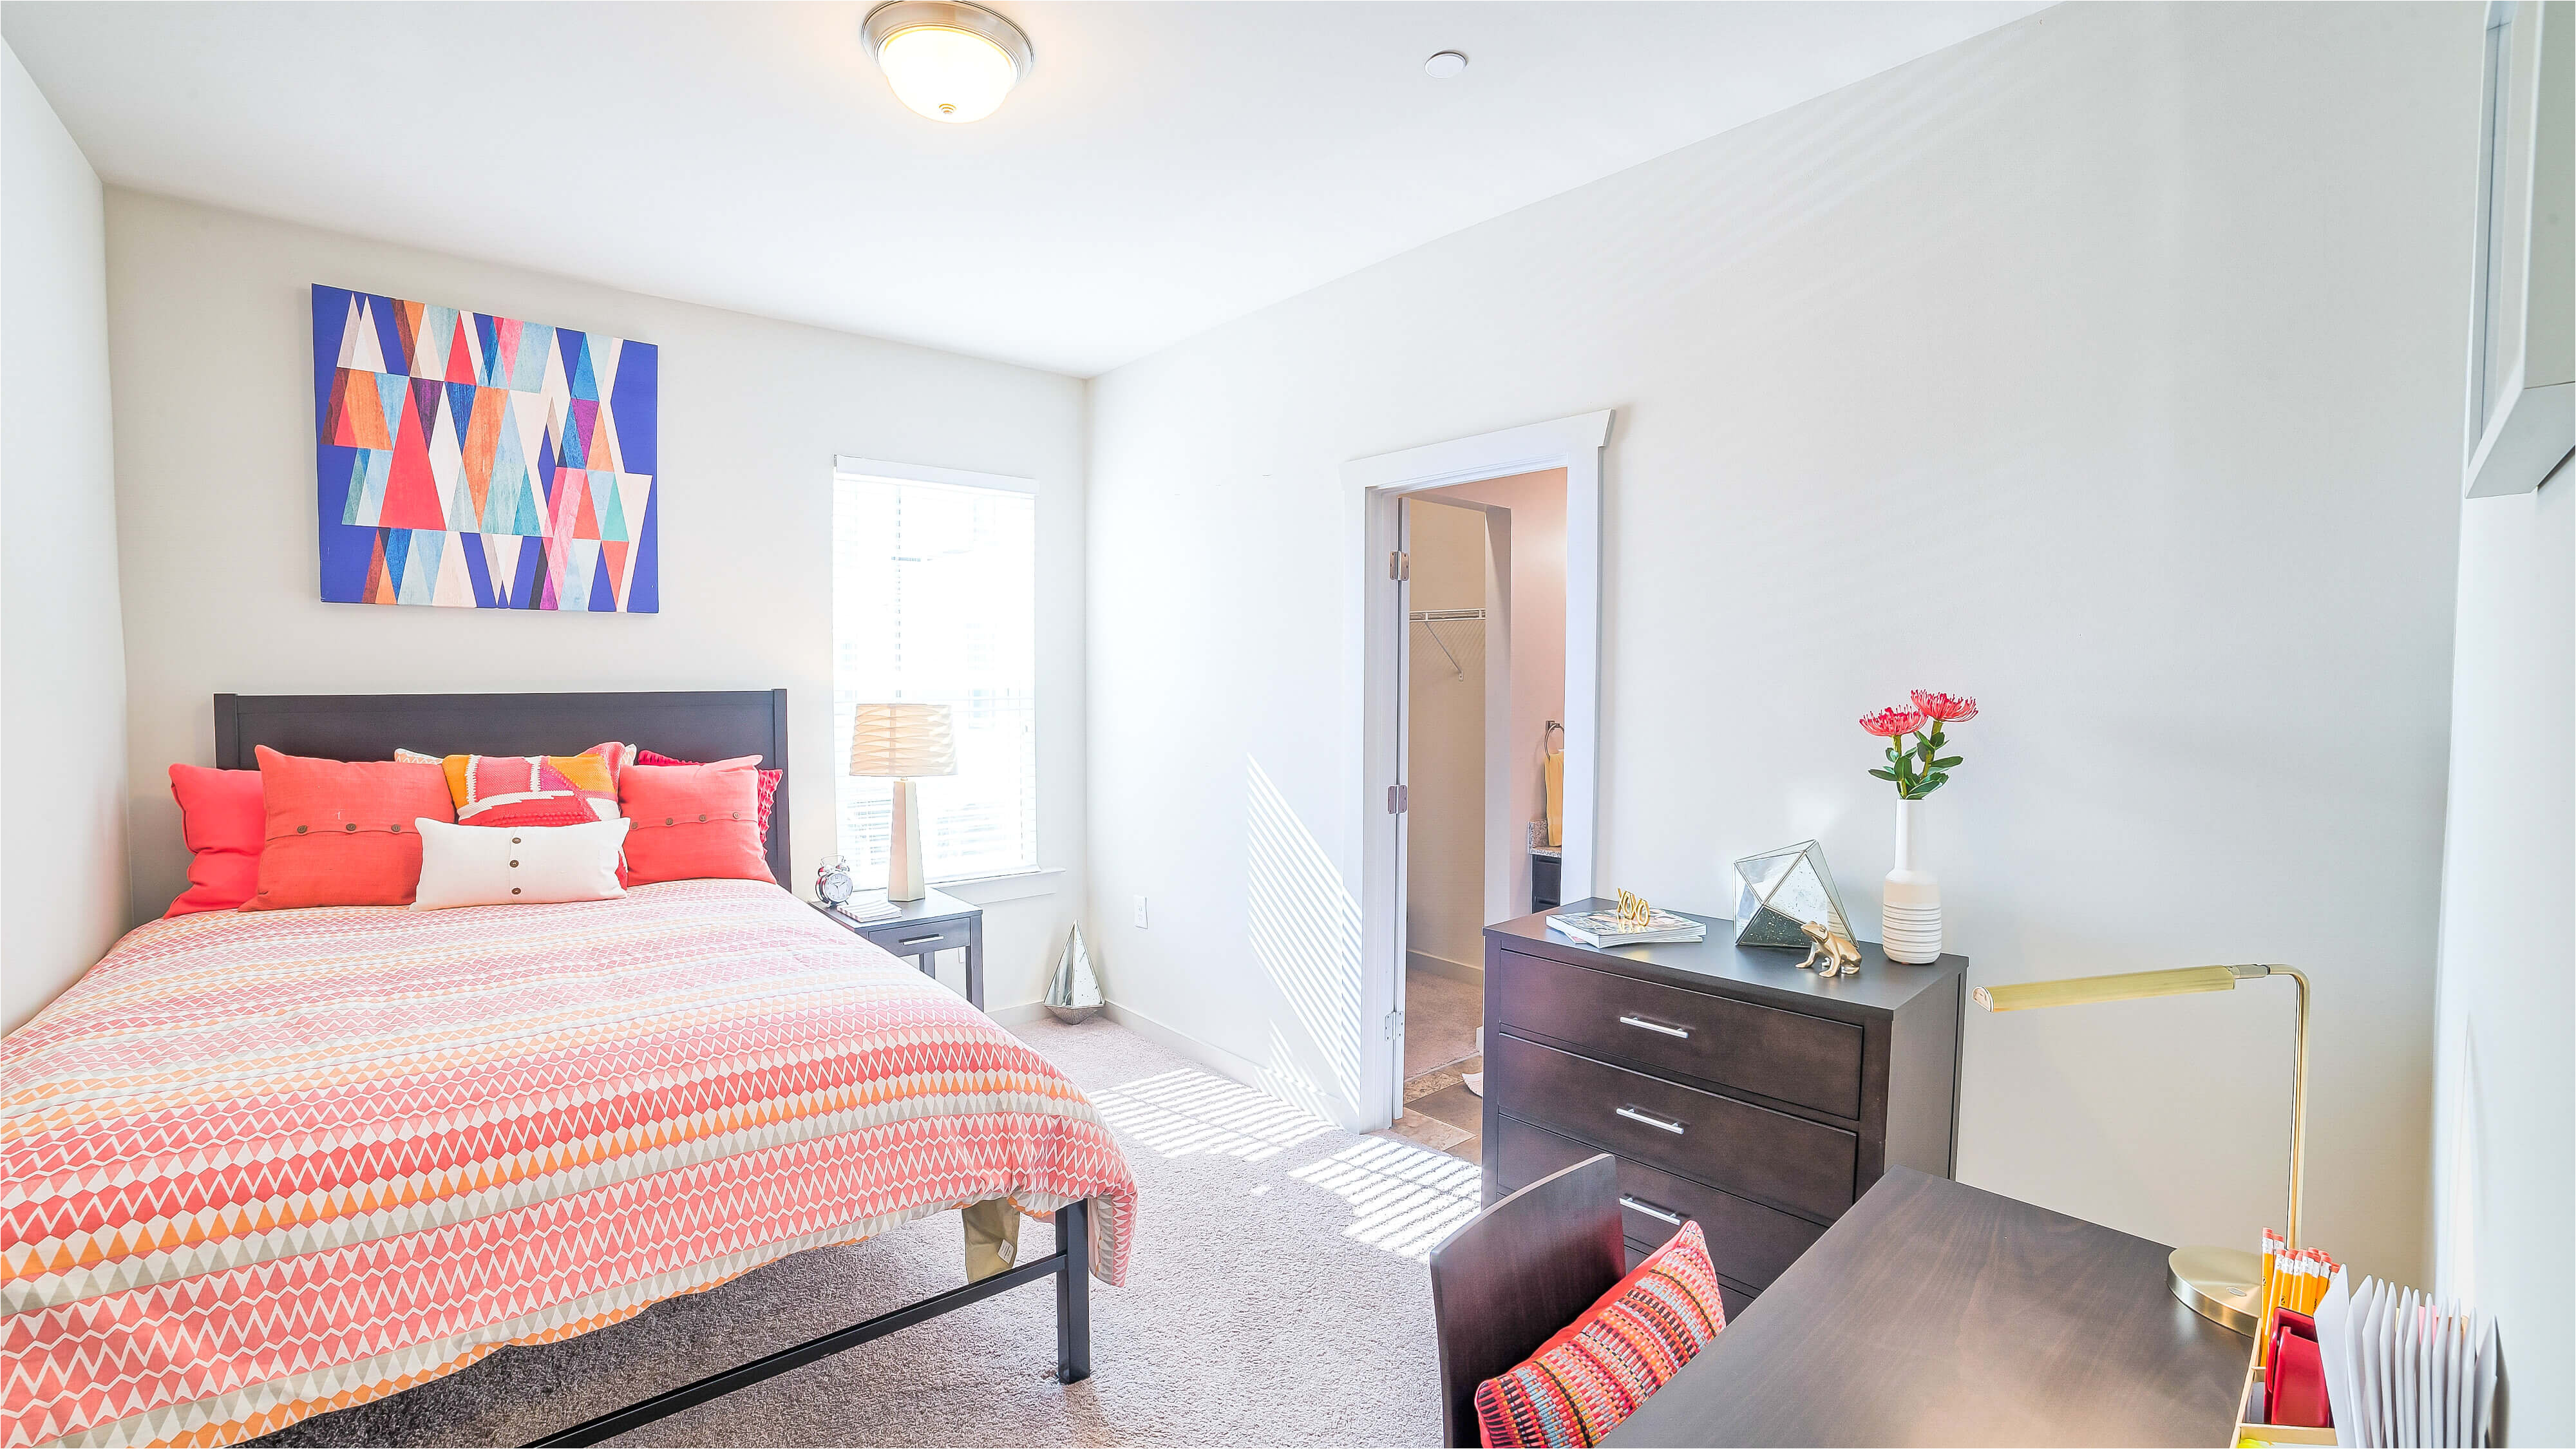 3 4 5 bedroom apartments